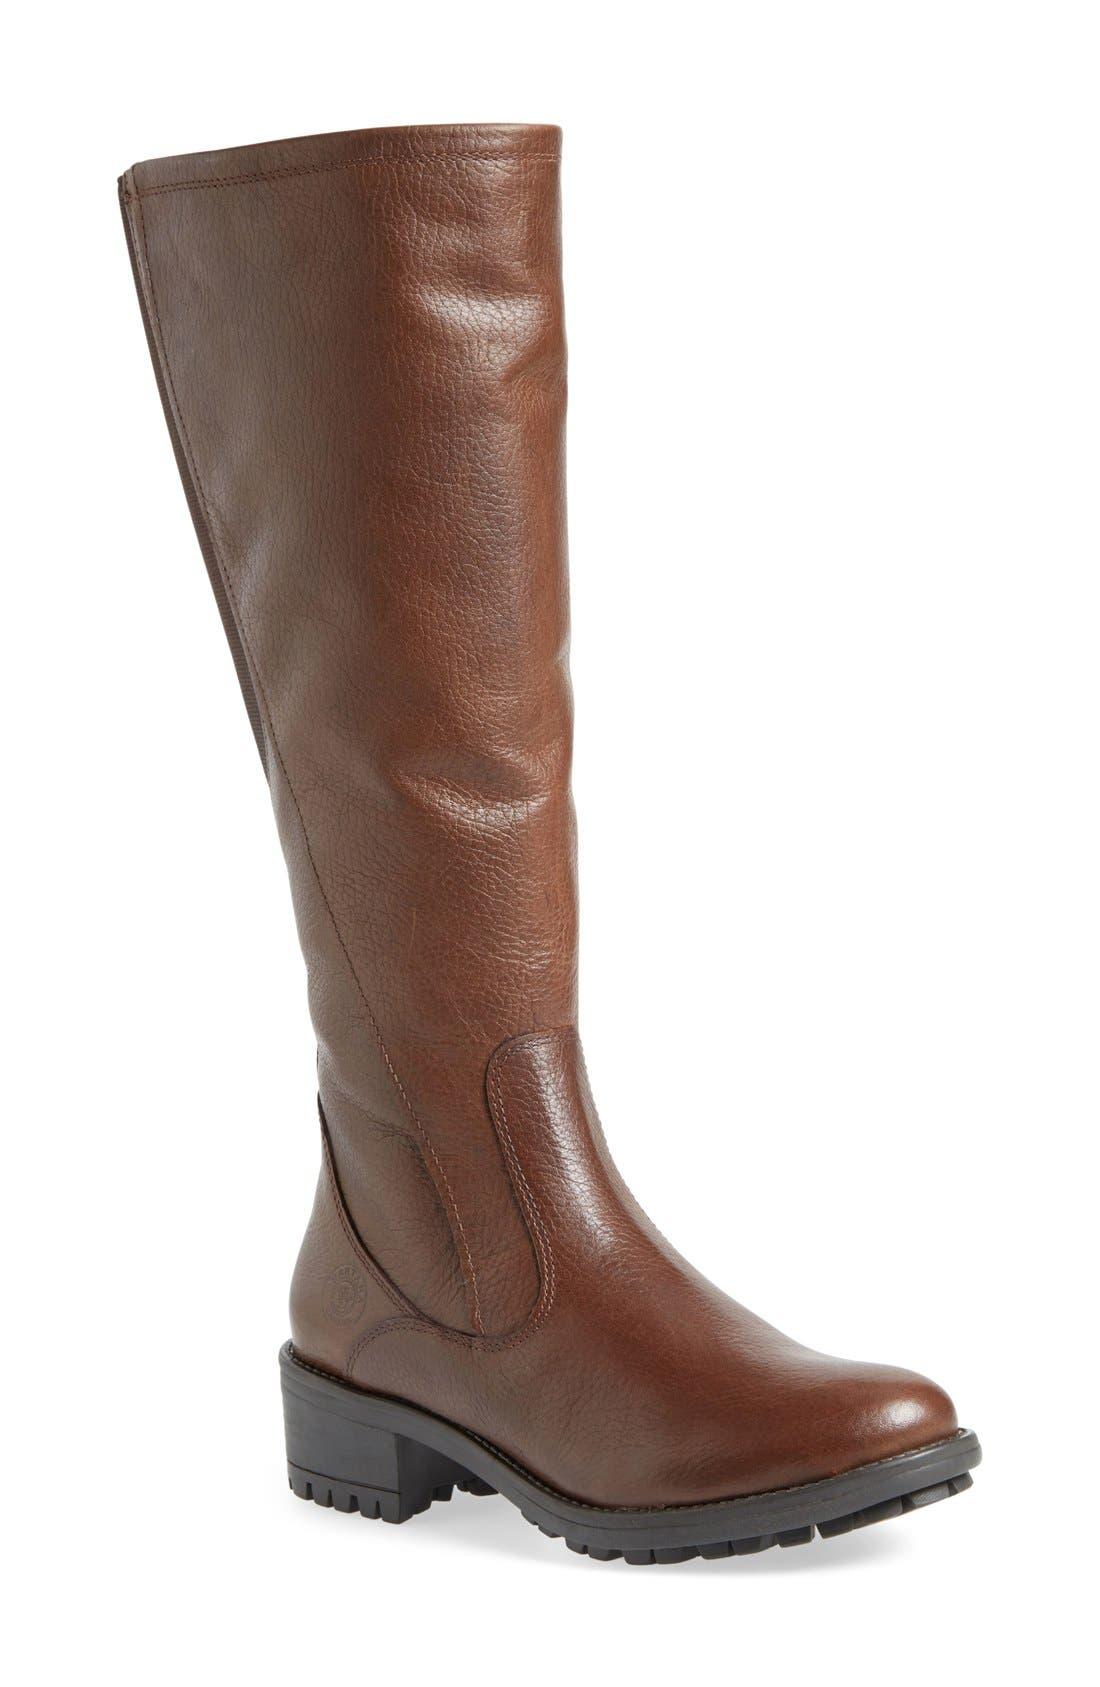 'Andrea' Waterproof Boot,                             Main thumbnail 1, color,                             Brown Pebbled Leather Regular